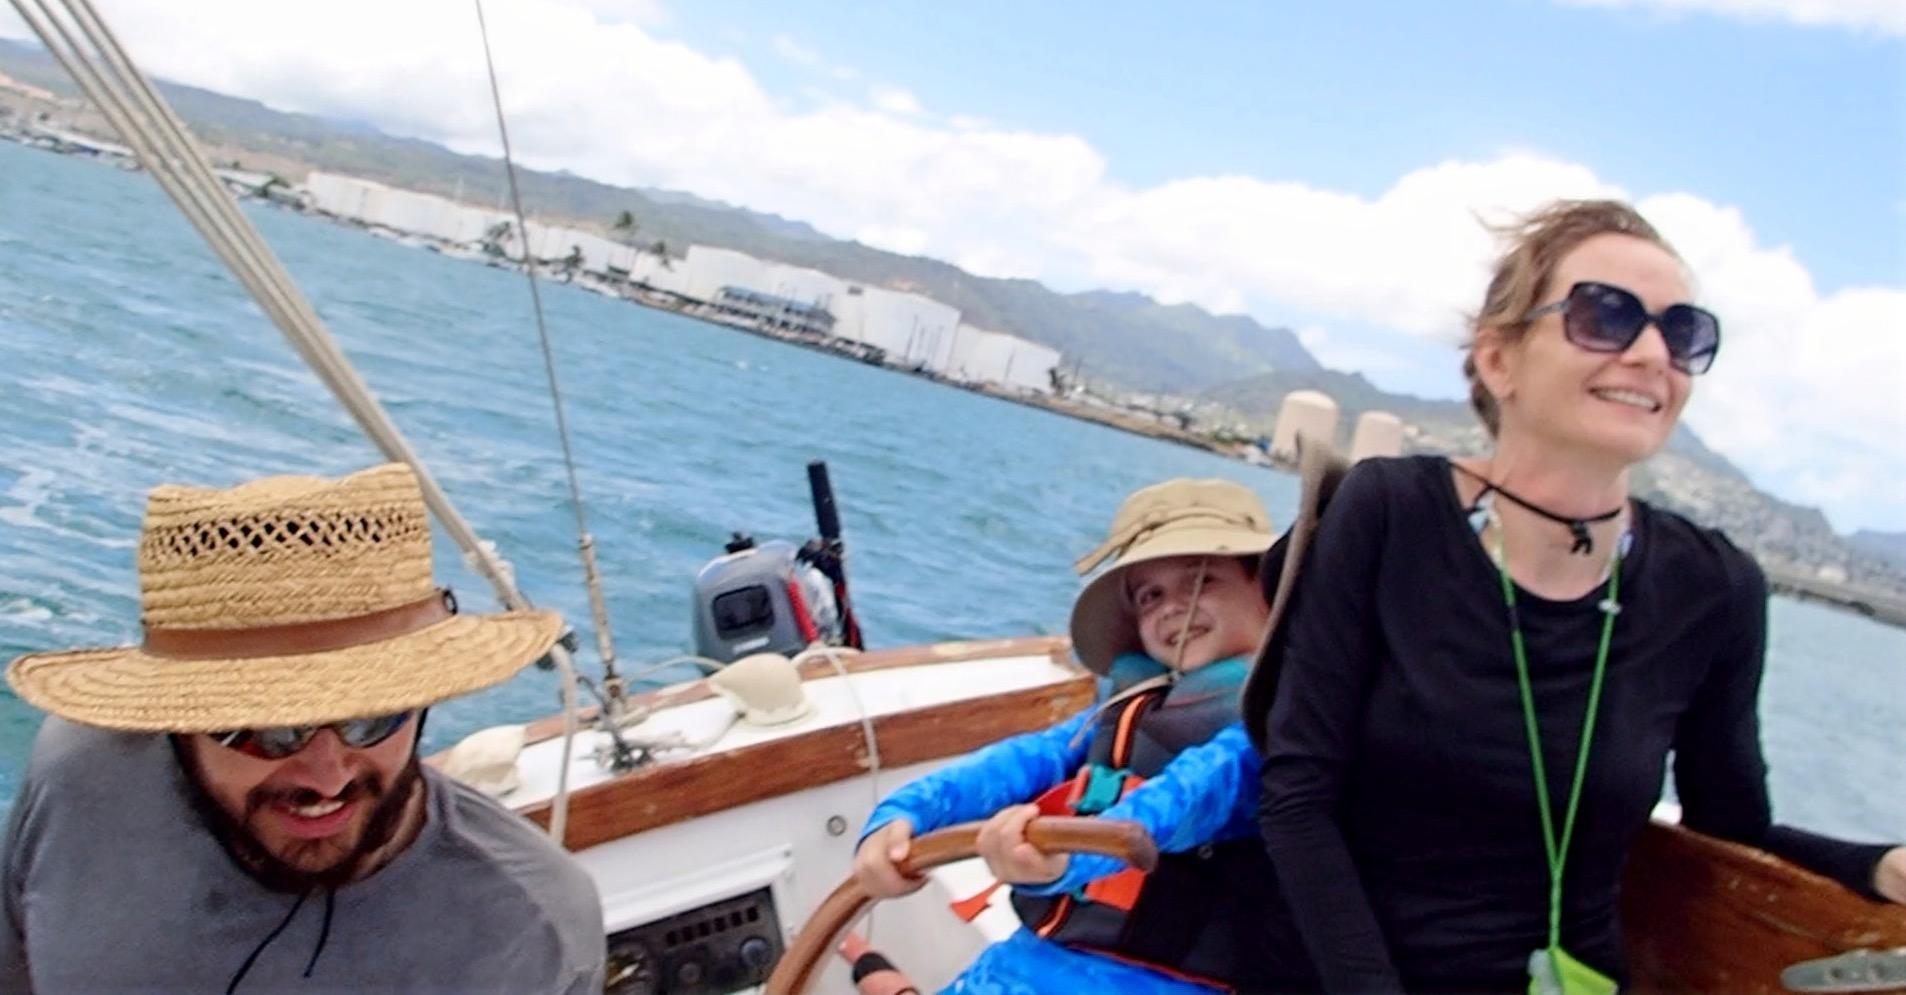 we sailed as a team_edited